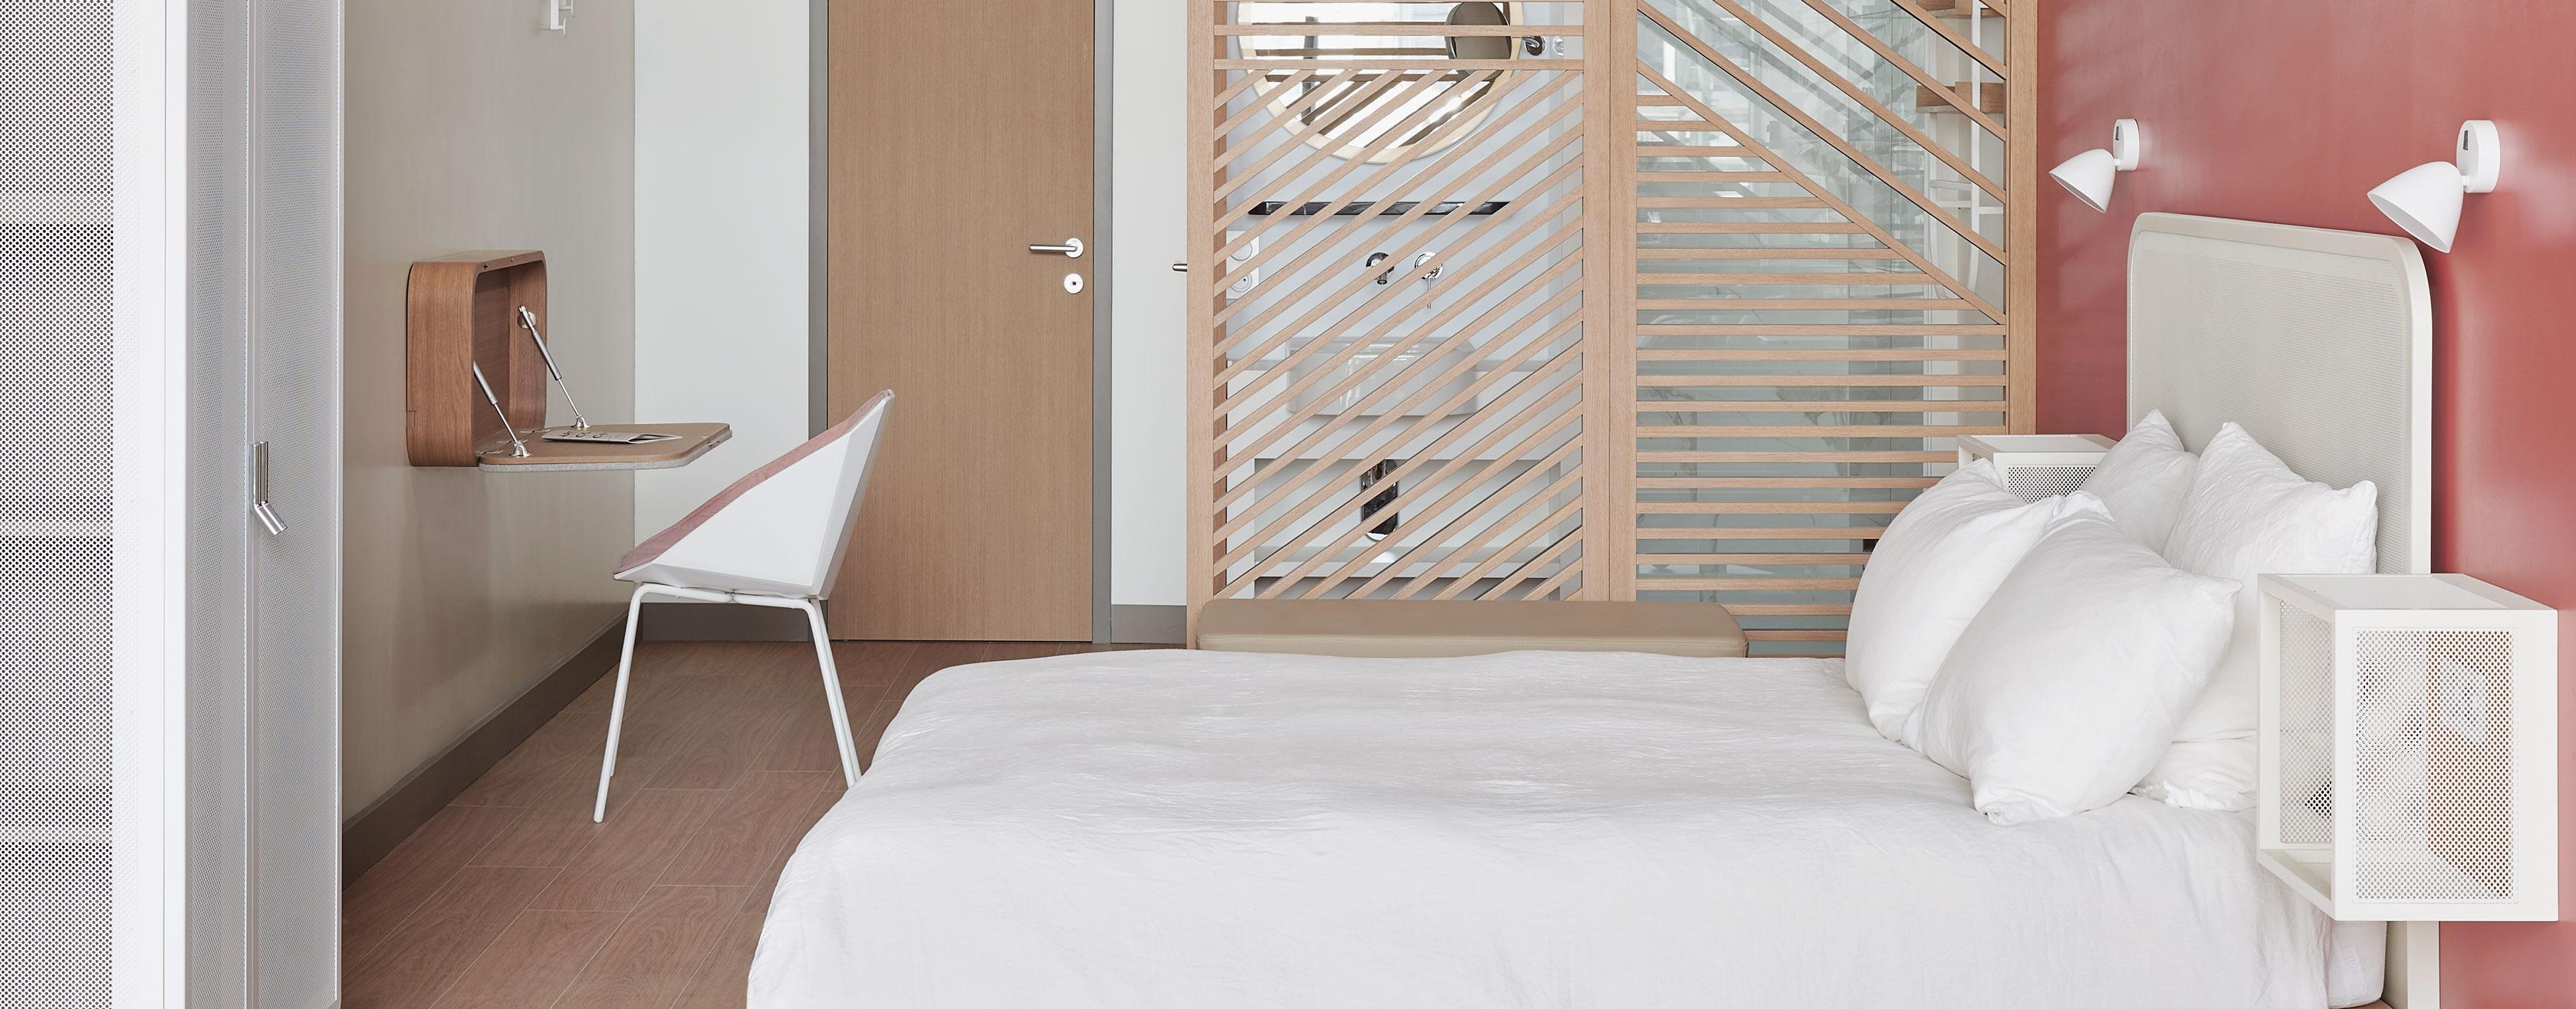 New bedroom concept Okko Hotels Ligne Roset